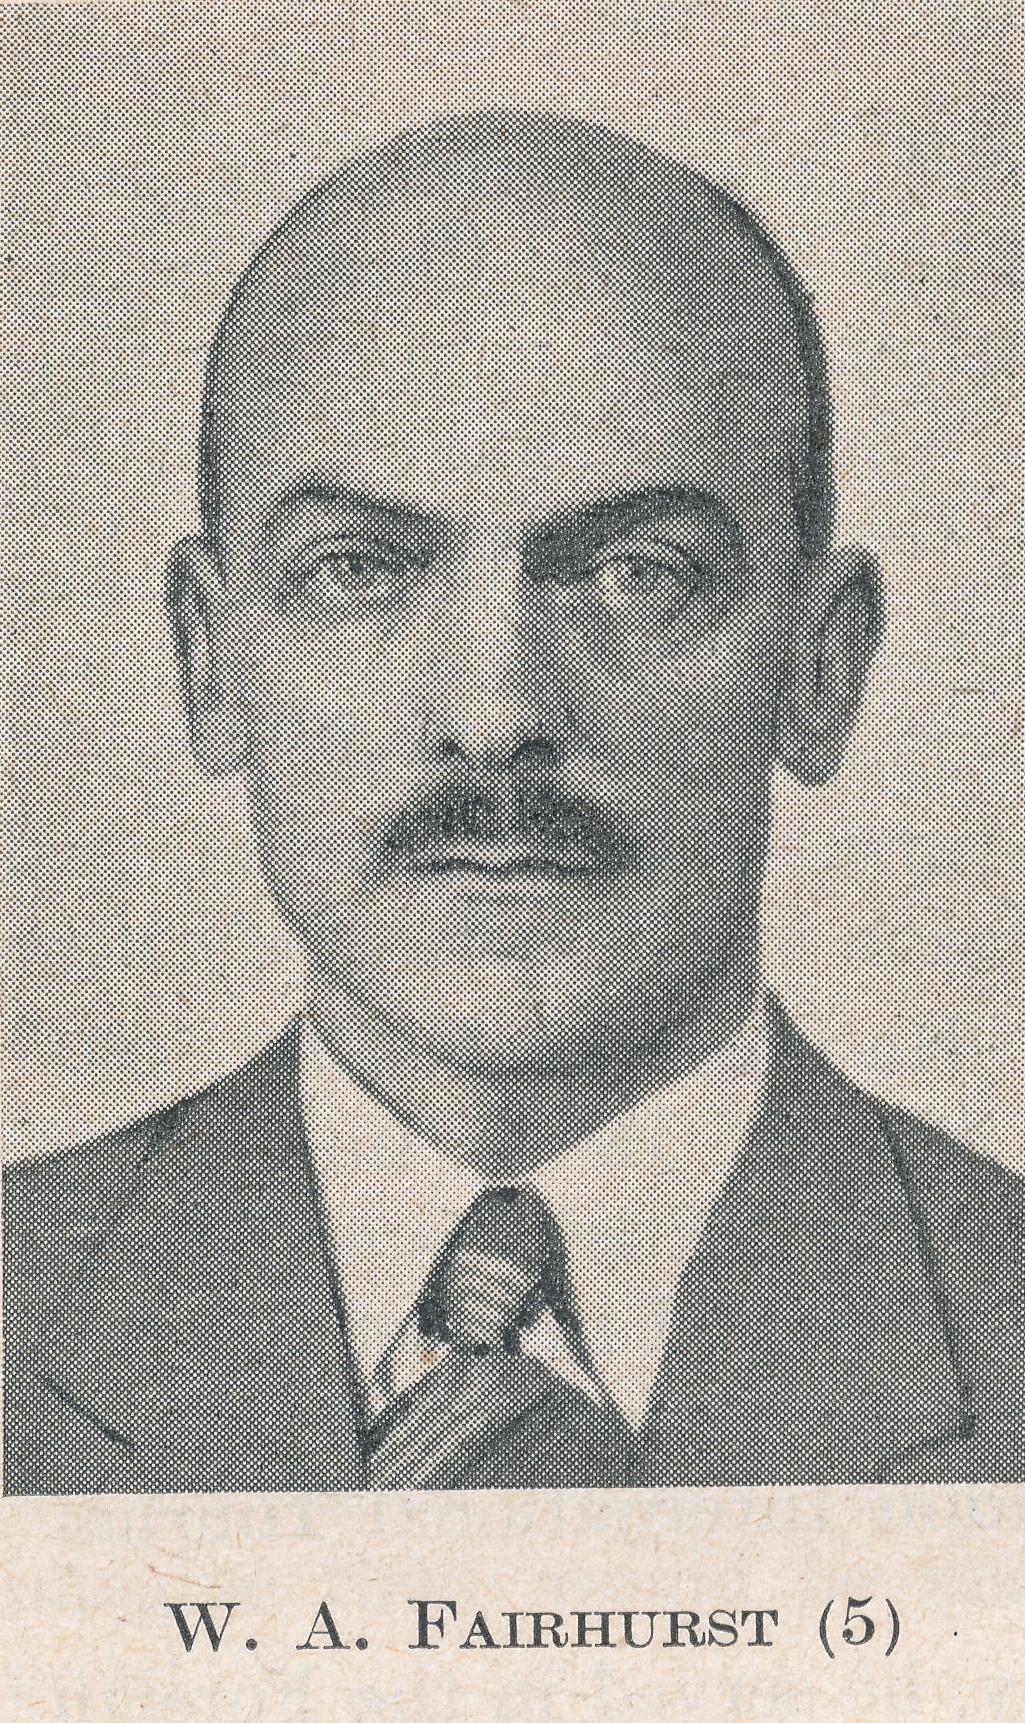 IM William Albert Fairhurst CBE (21-viii-1903 -13-iii-1982) Source : The Anglo-Soviet Radio Chess Match